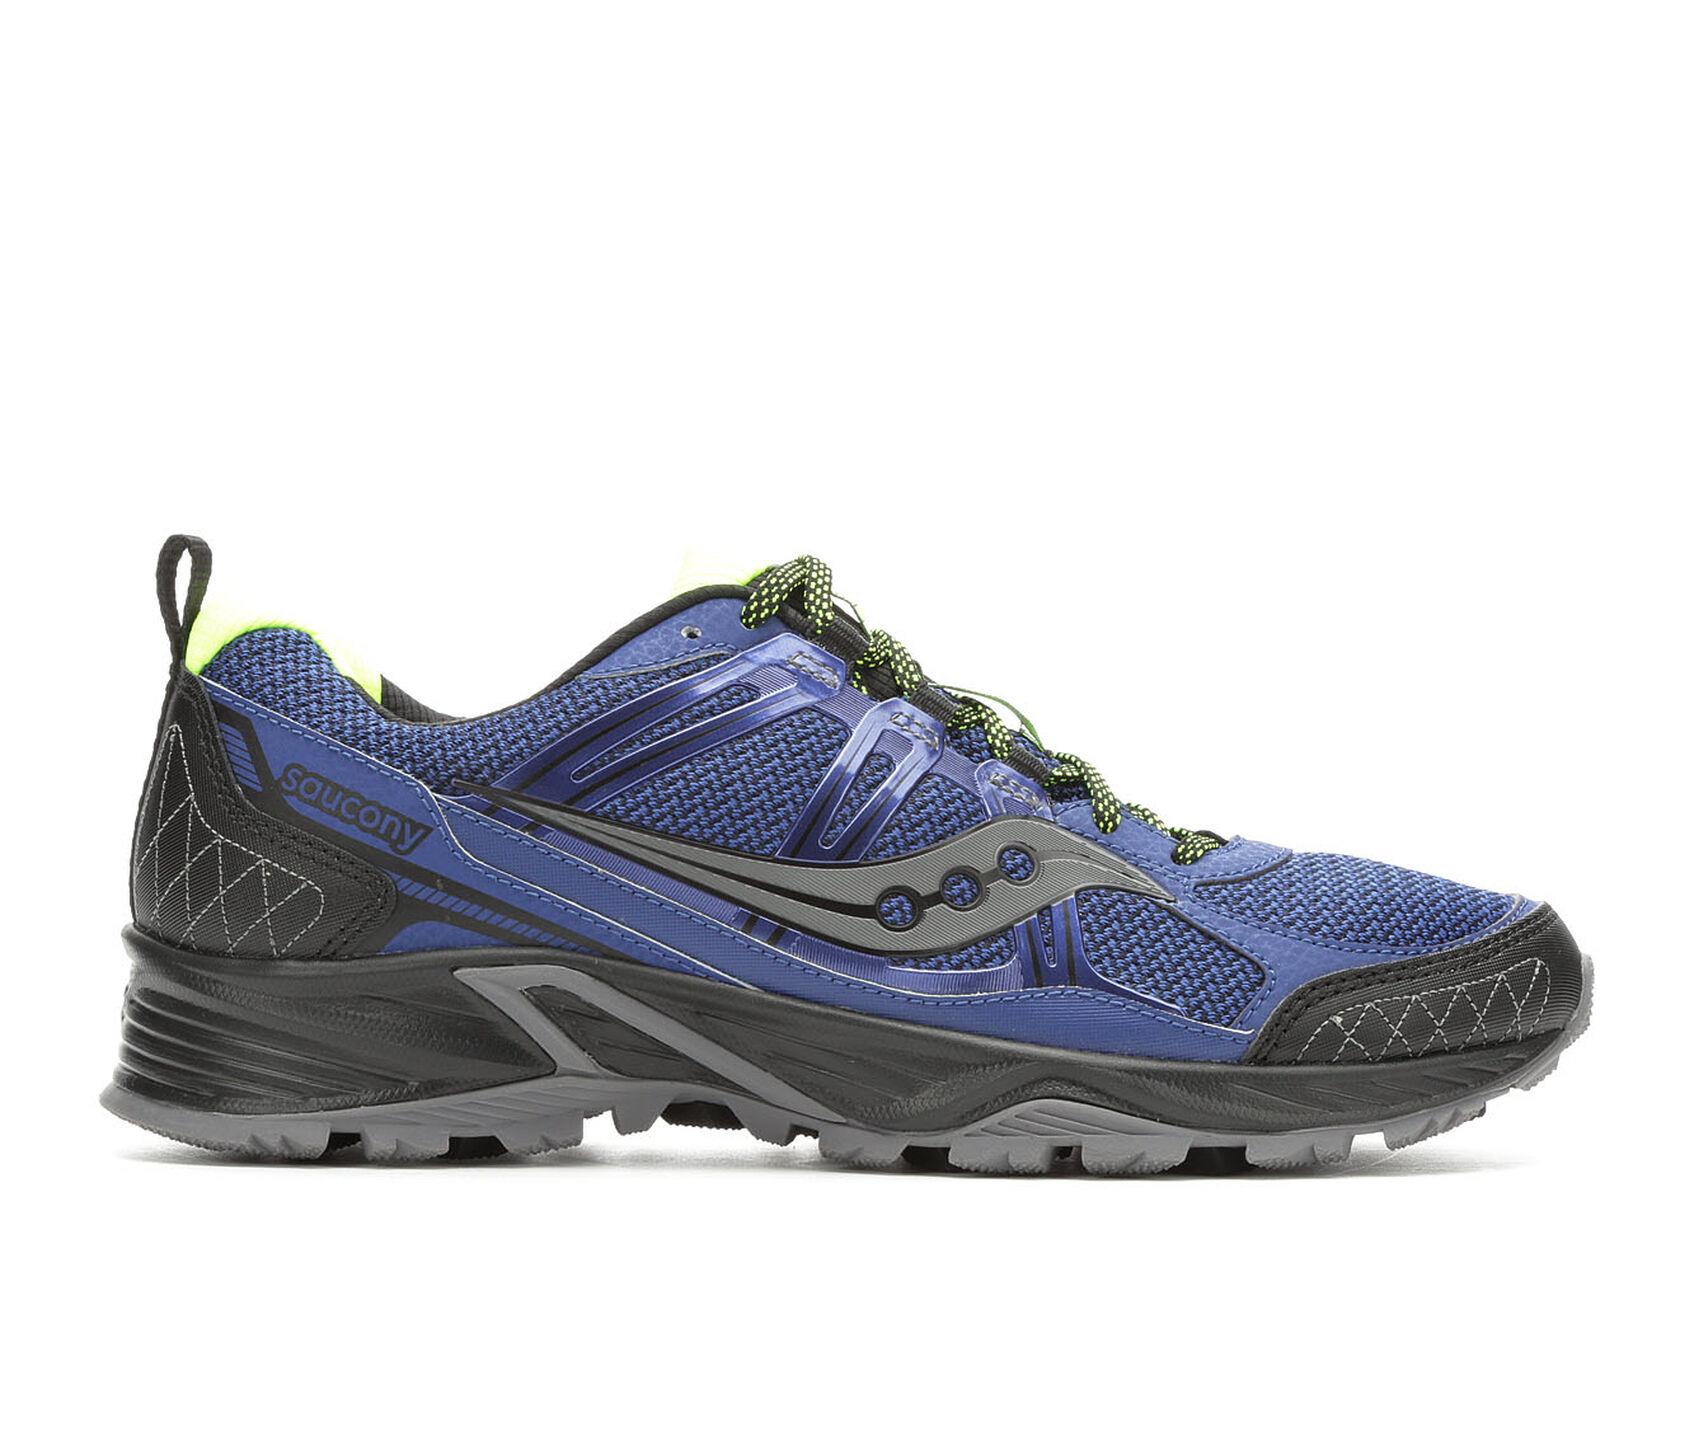 01b0bd7d3fb5 Men s Saucony Grid Eclipse TR 4 Trail Running Shoes